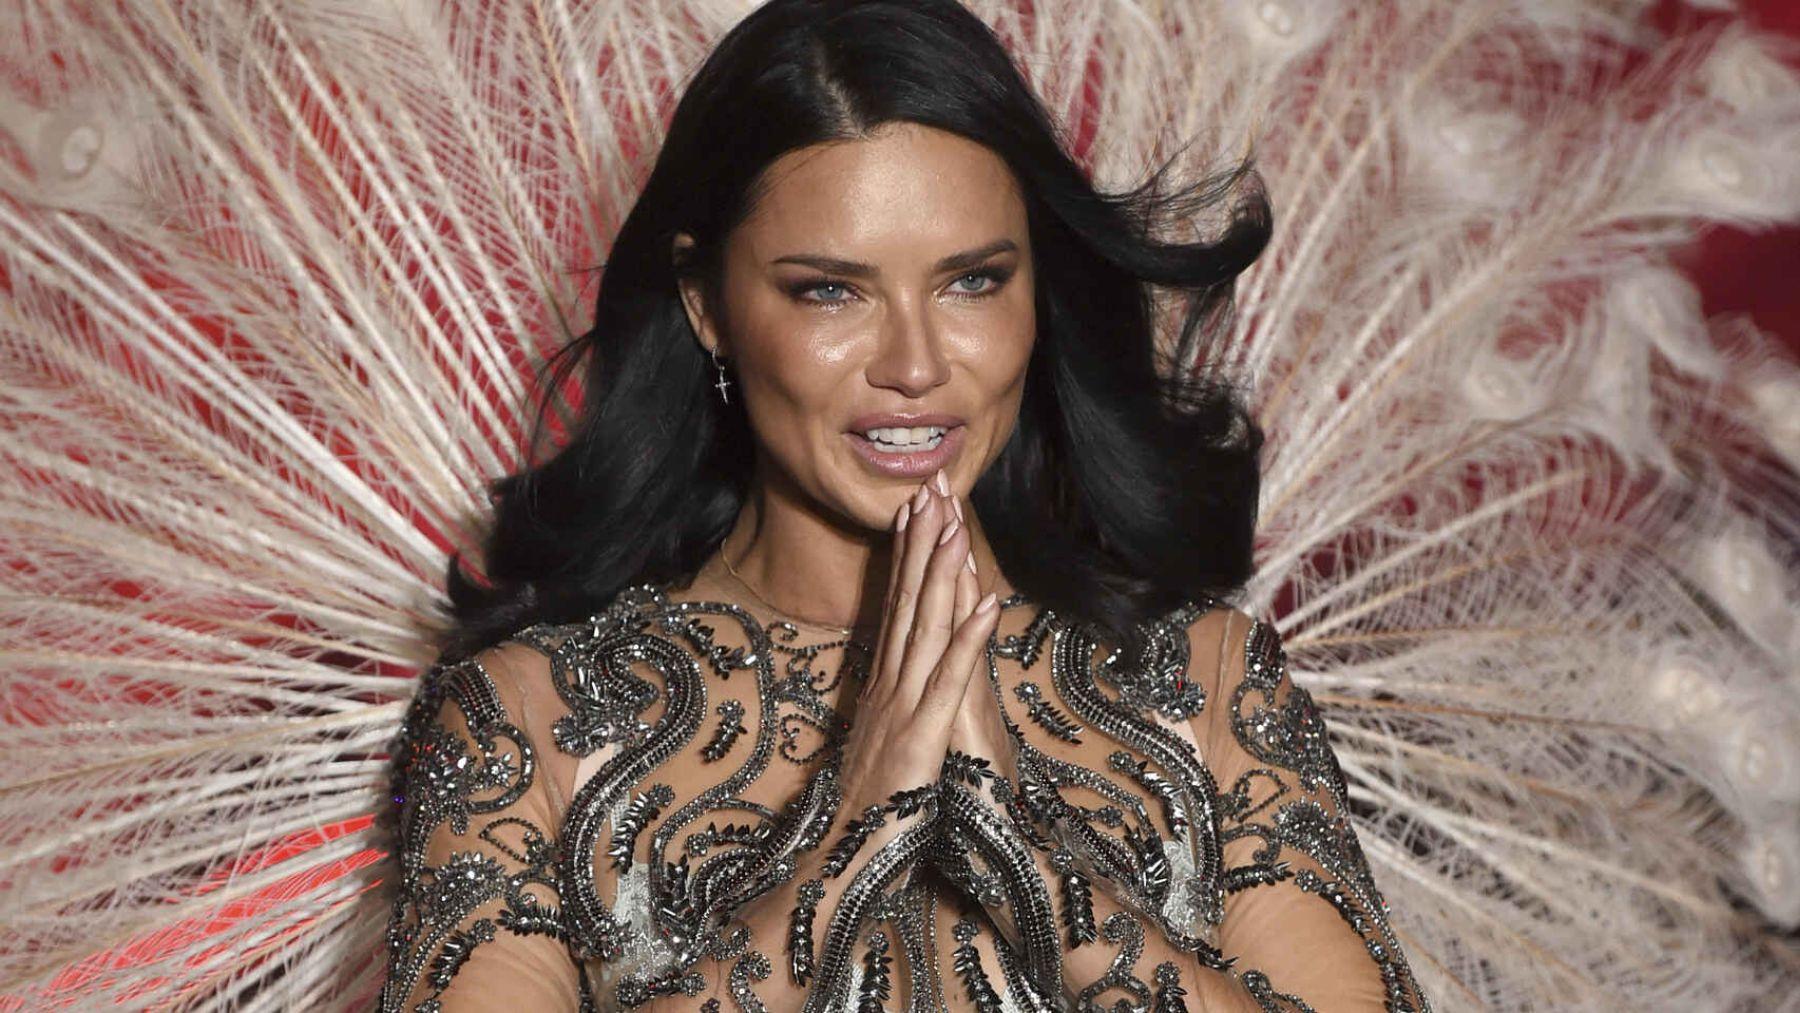 La modelo Adriana Lima celebra hoy su santo